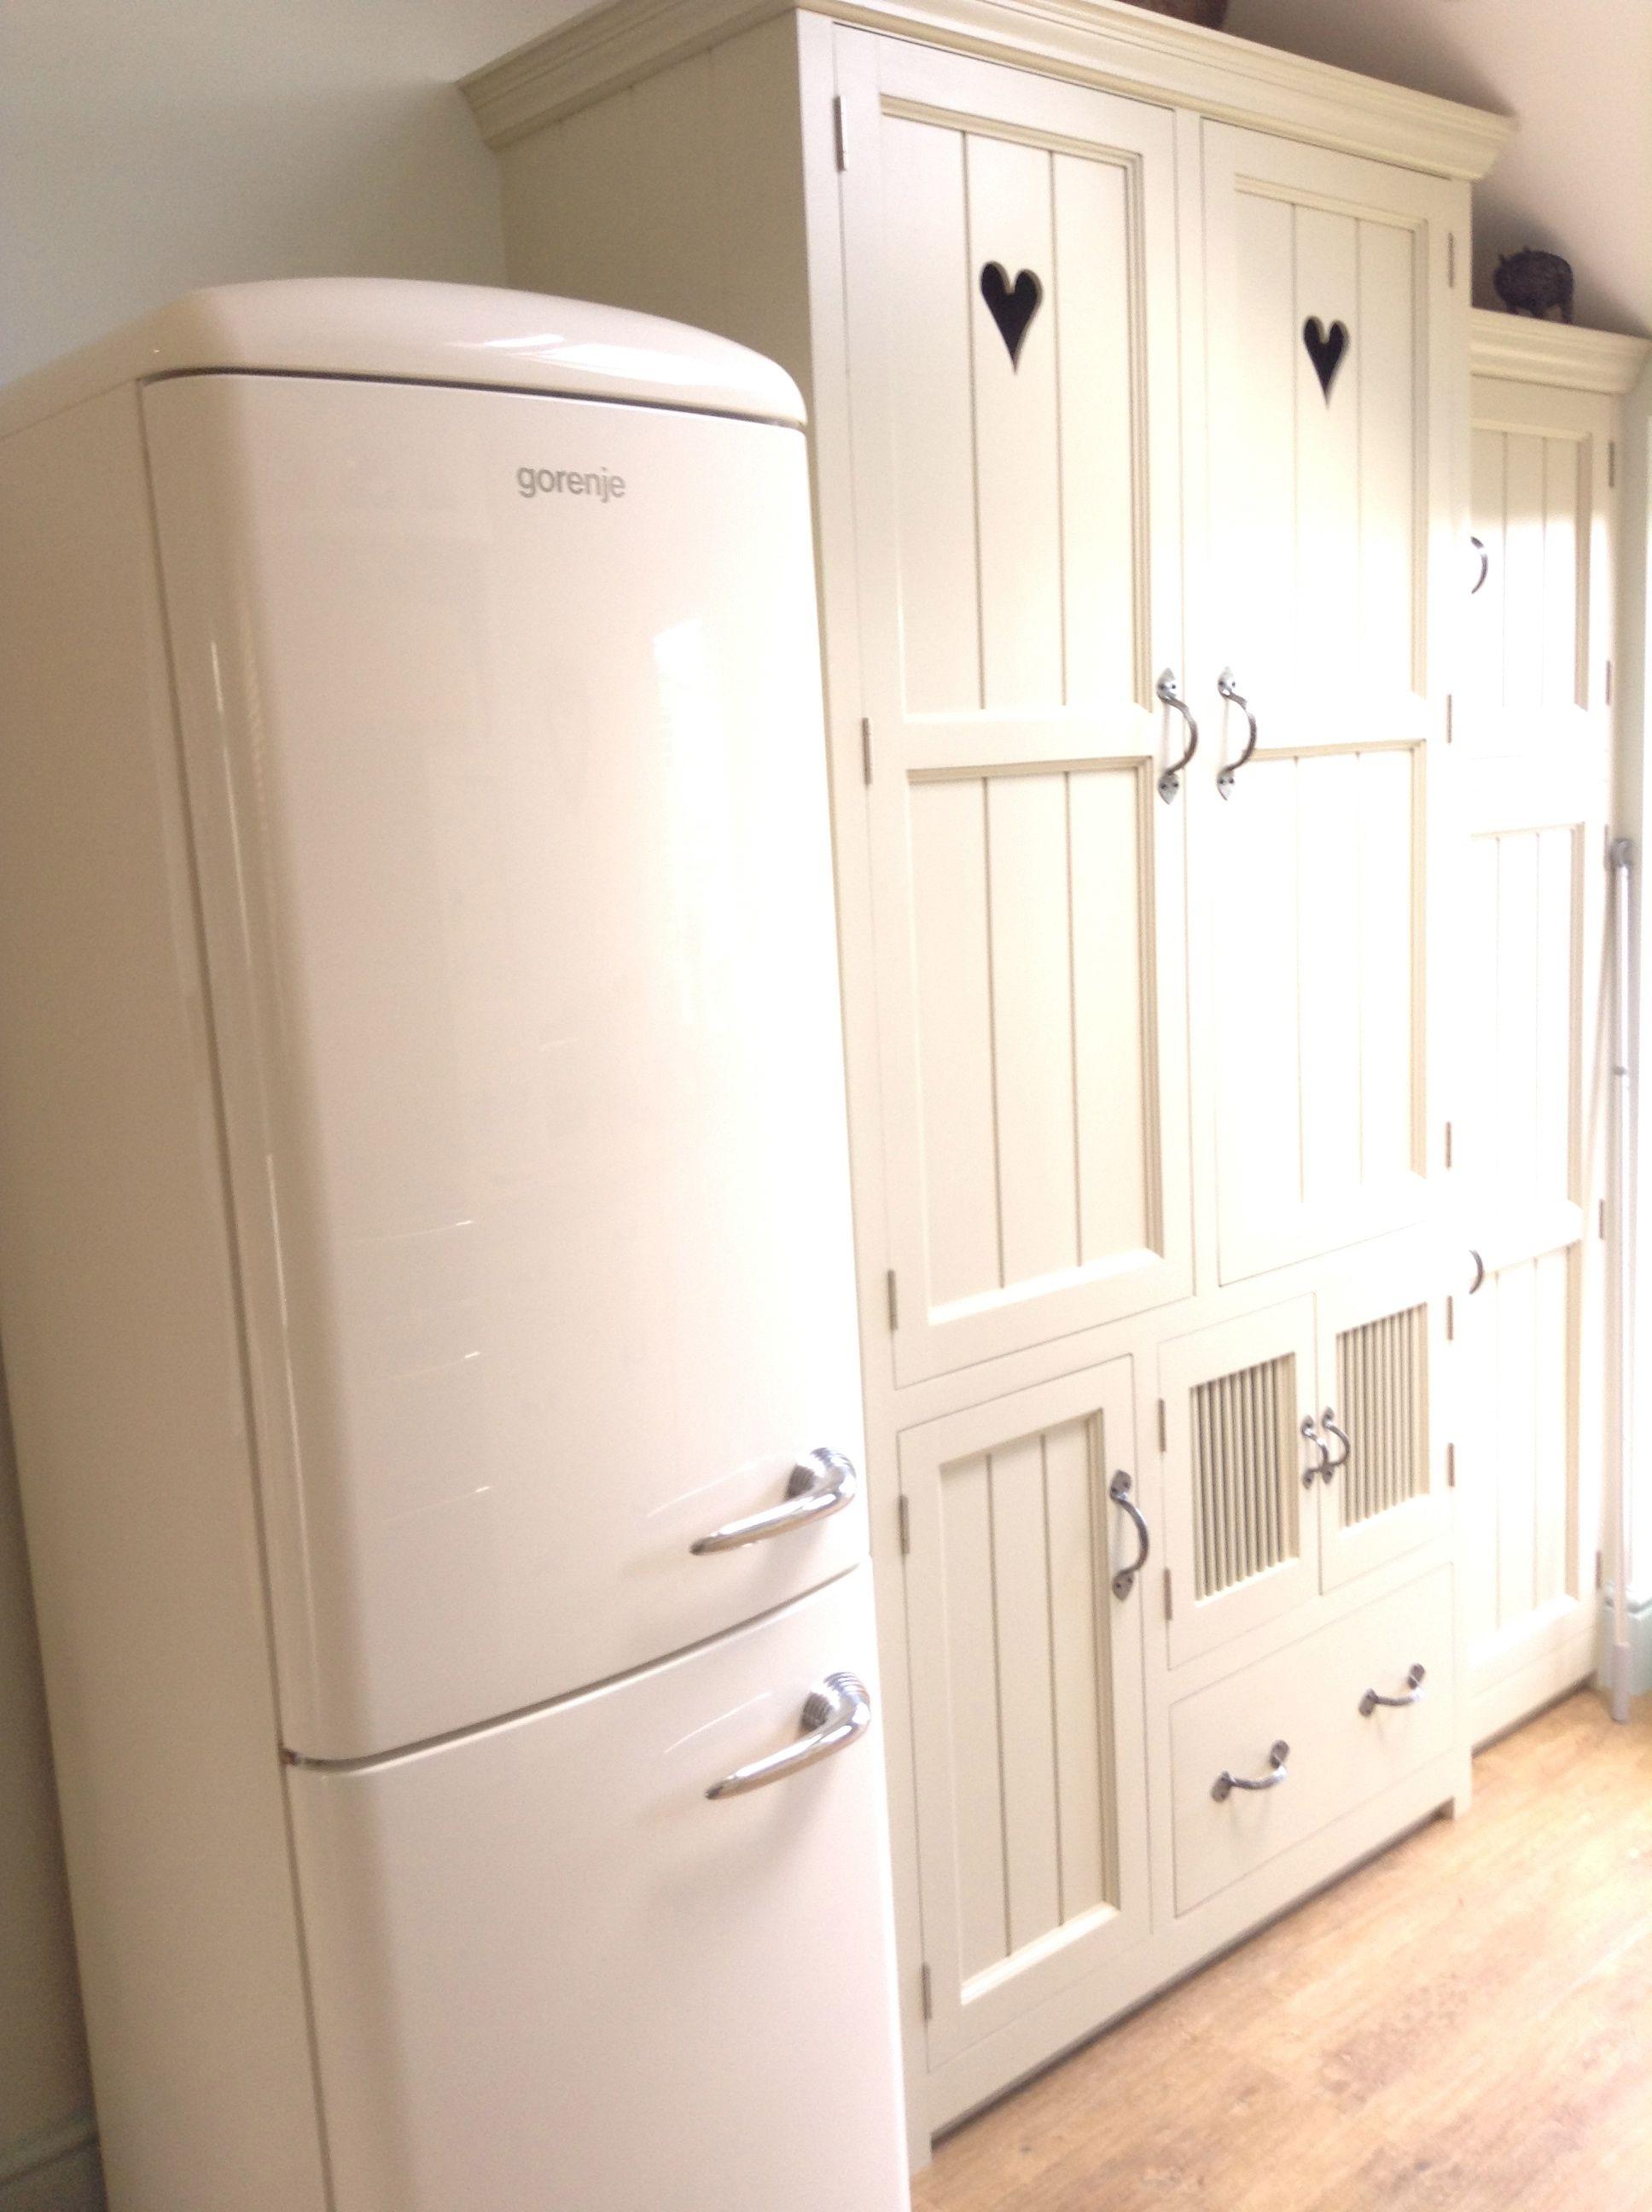 Gorenje Retro Fridge Freezer Luxury Refrigerator Retro Fridge New Homes